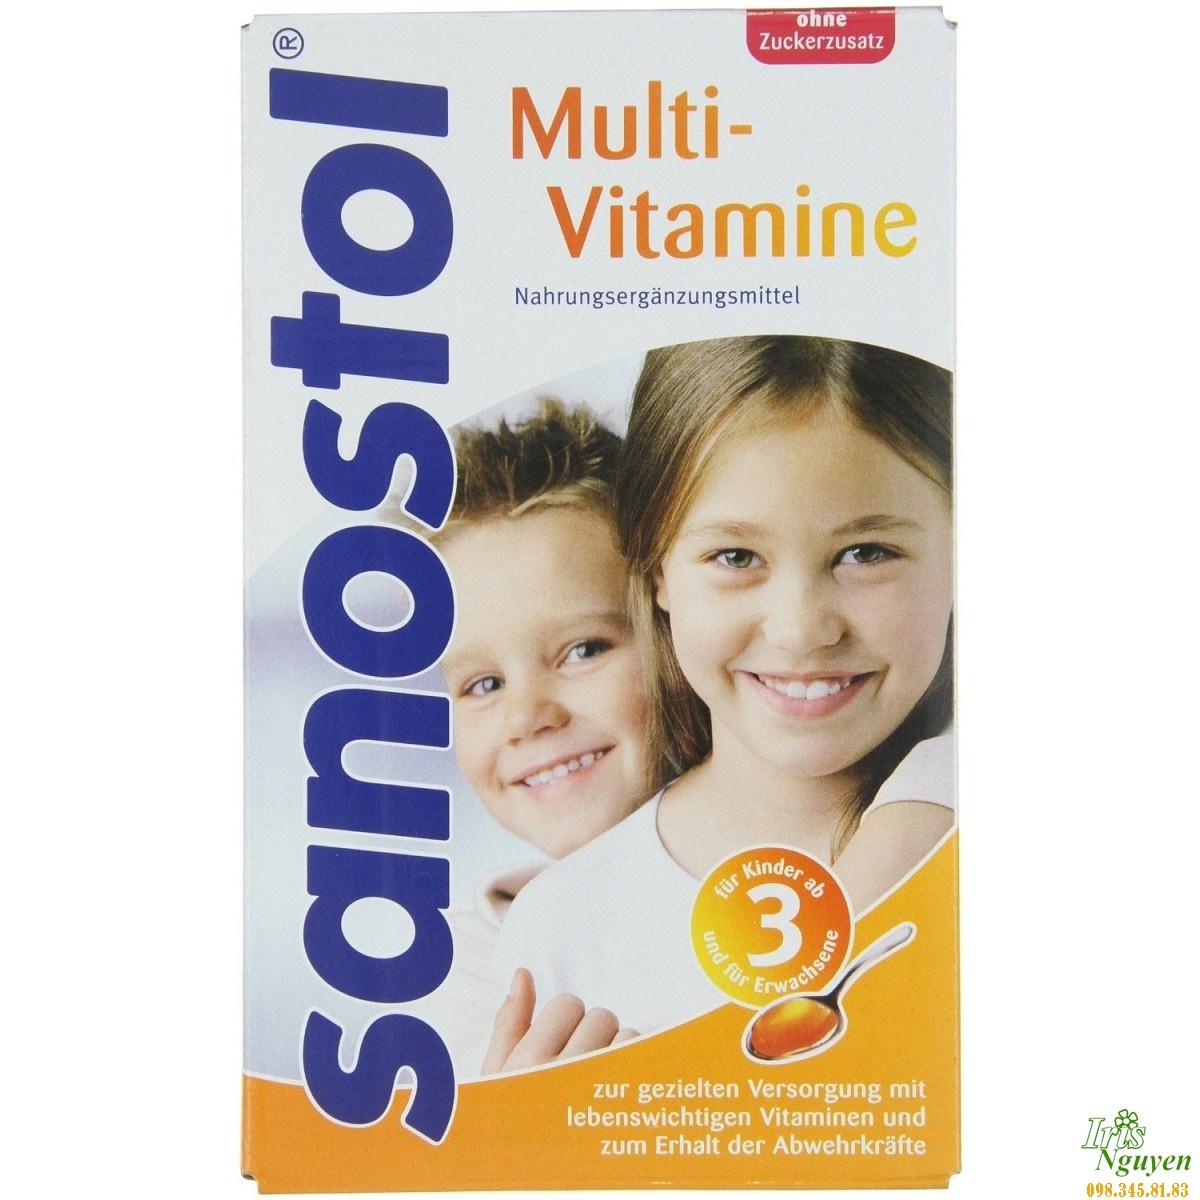 Vitamin tổng hợp Sanostol số 6 dạng siro